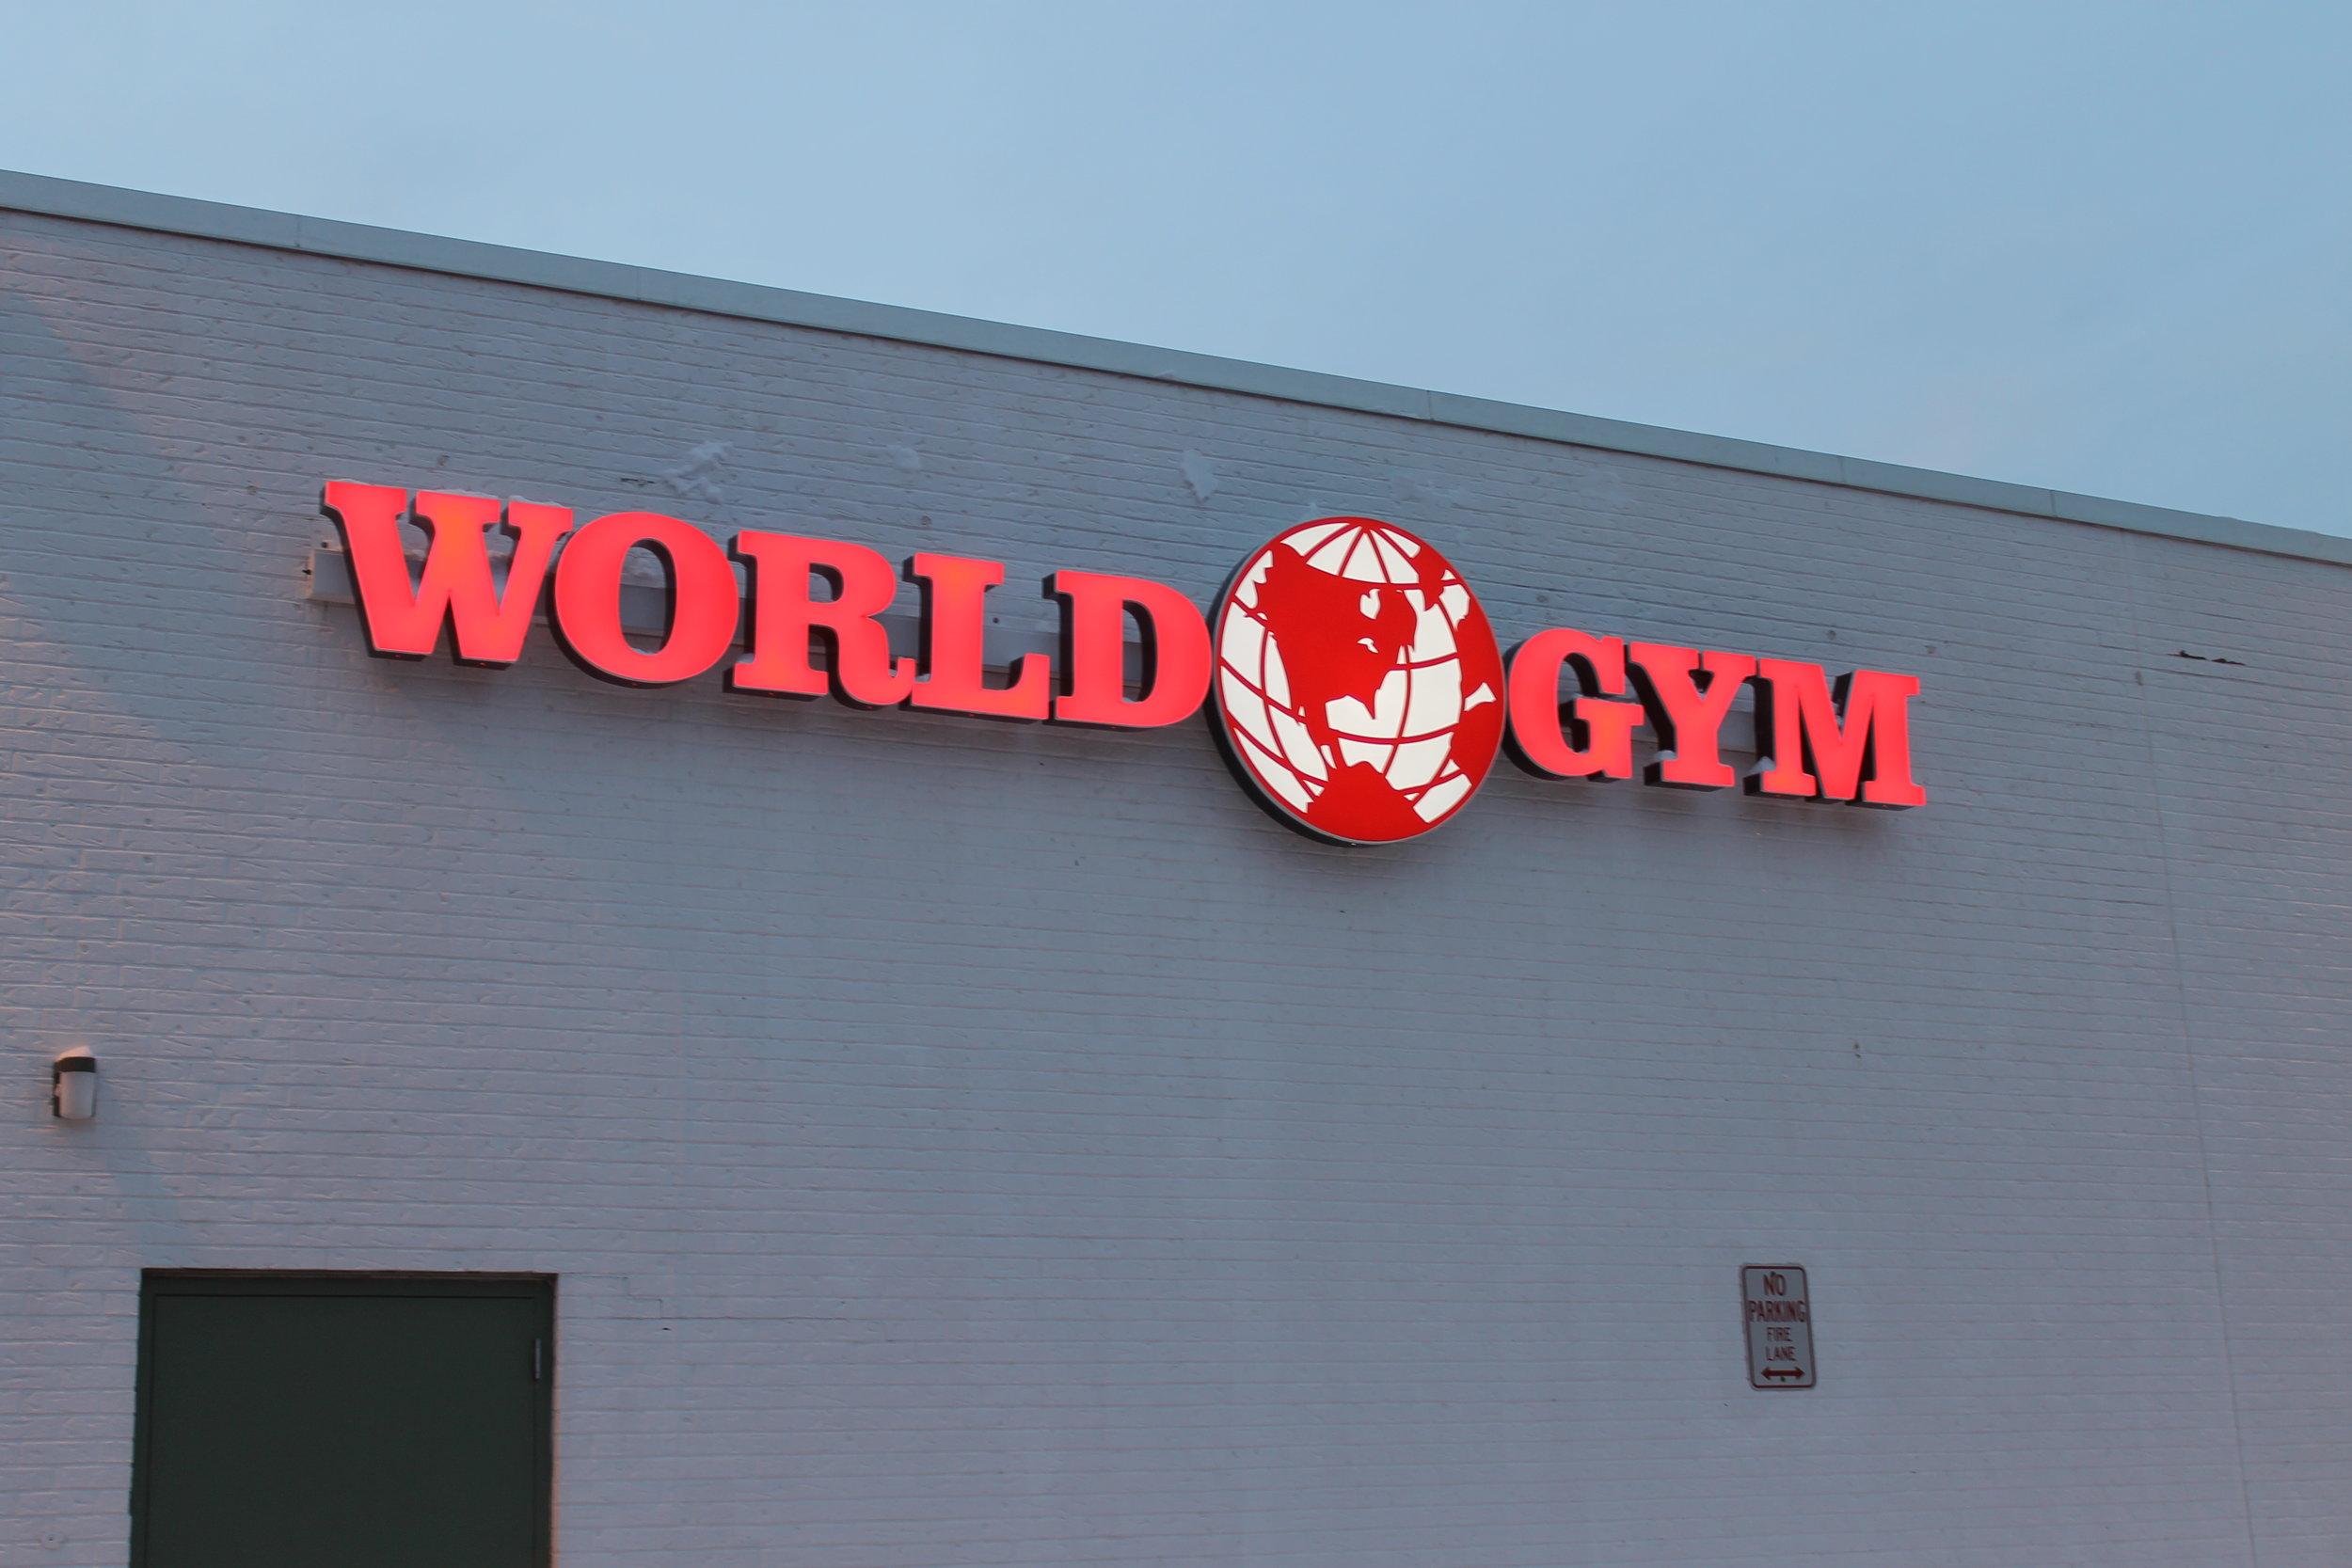 World Gym Exterior raceway .JPG